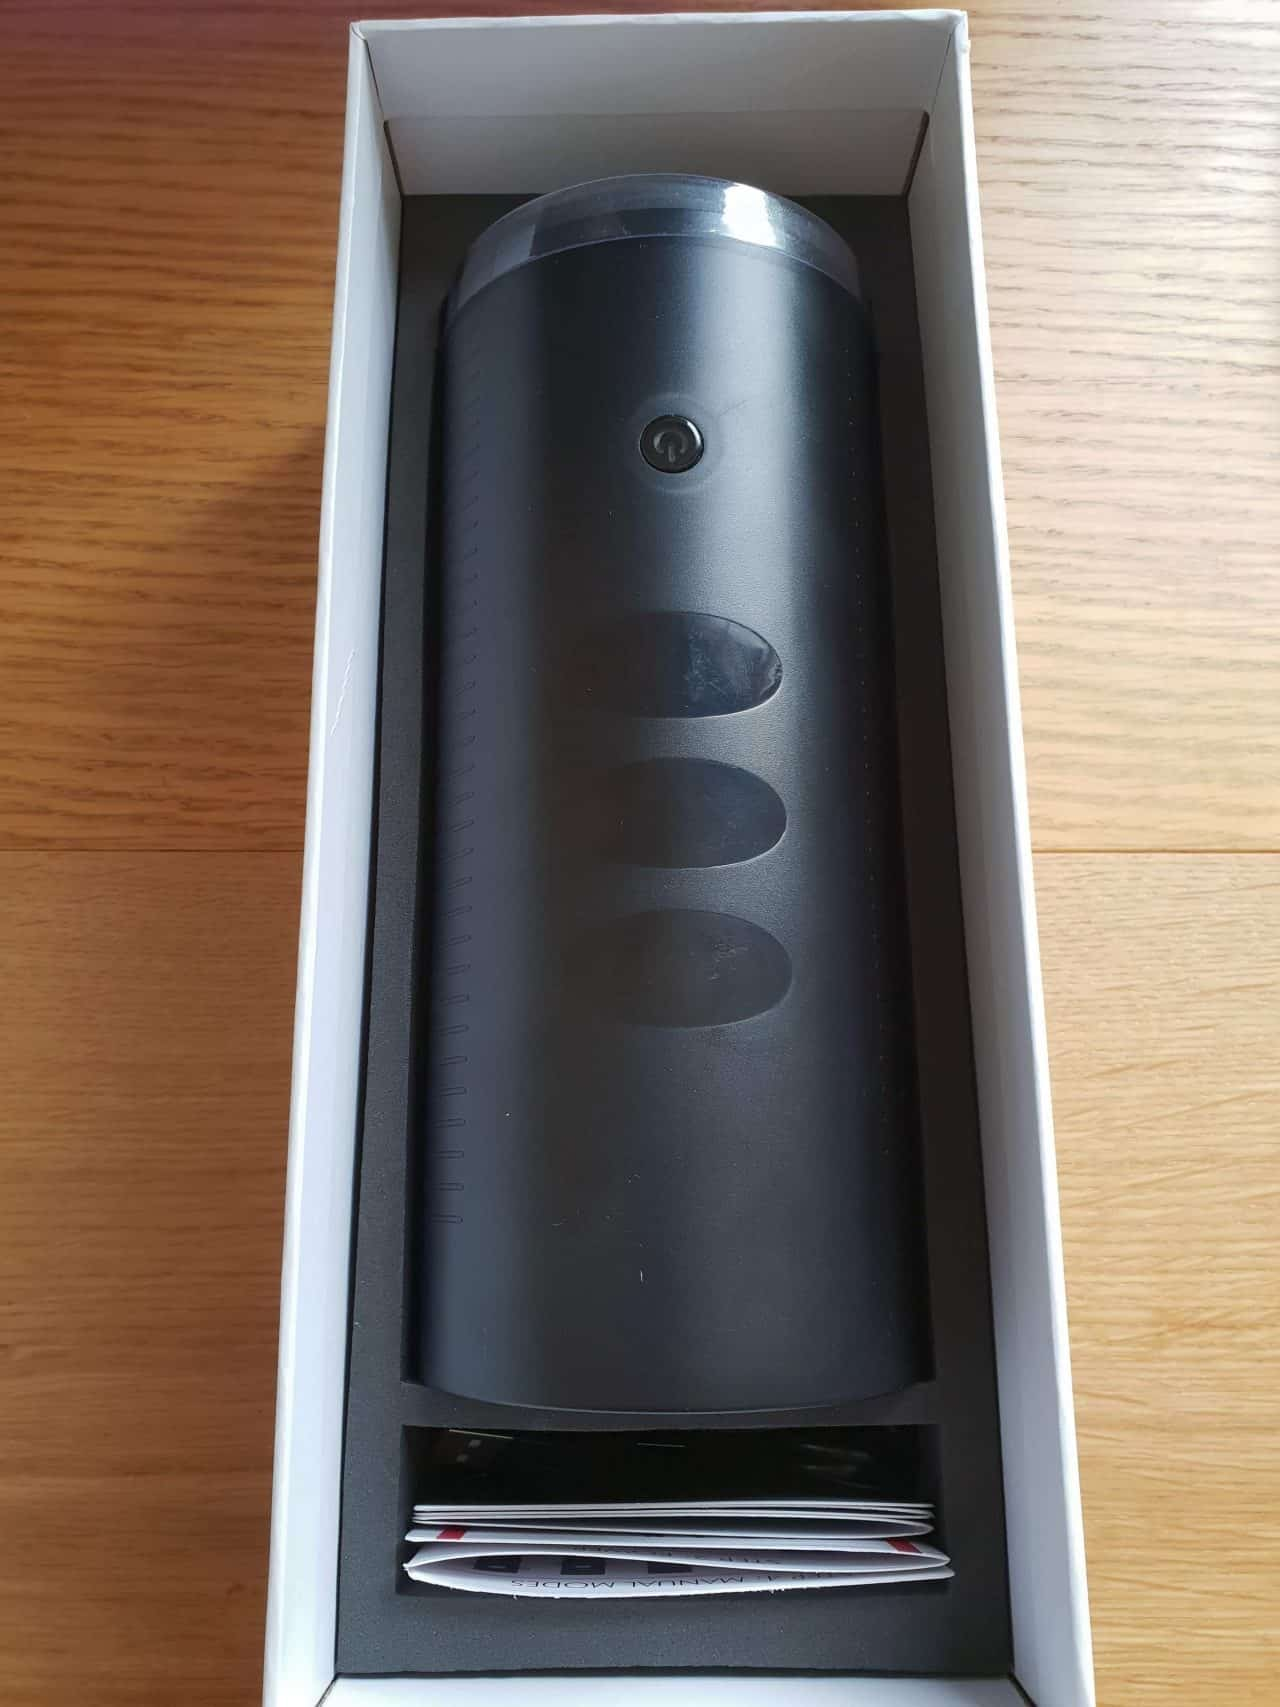 Kiiroo Titan - Box